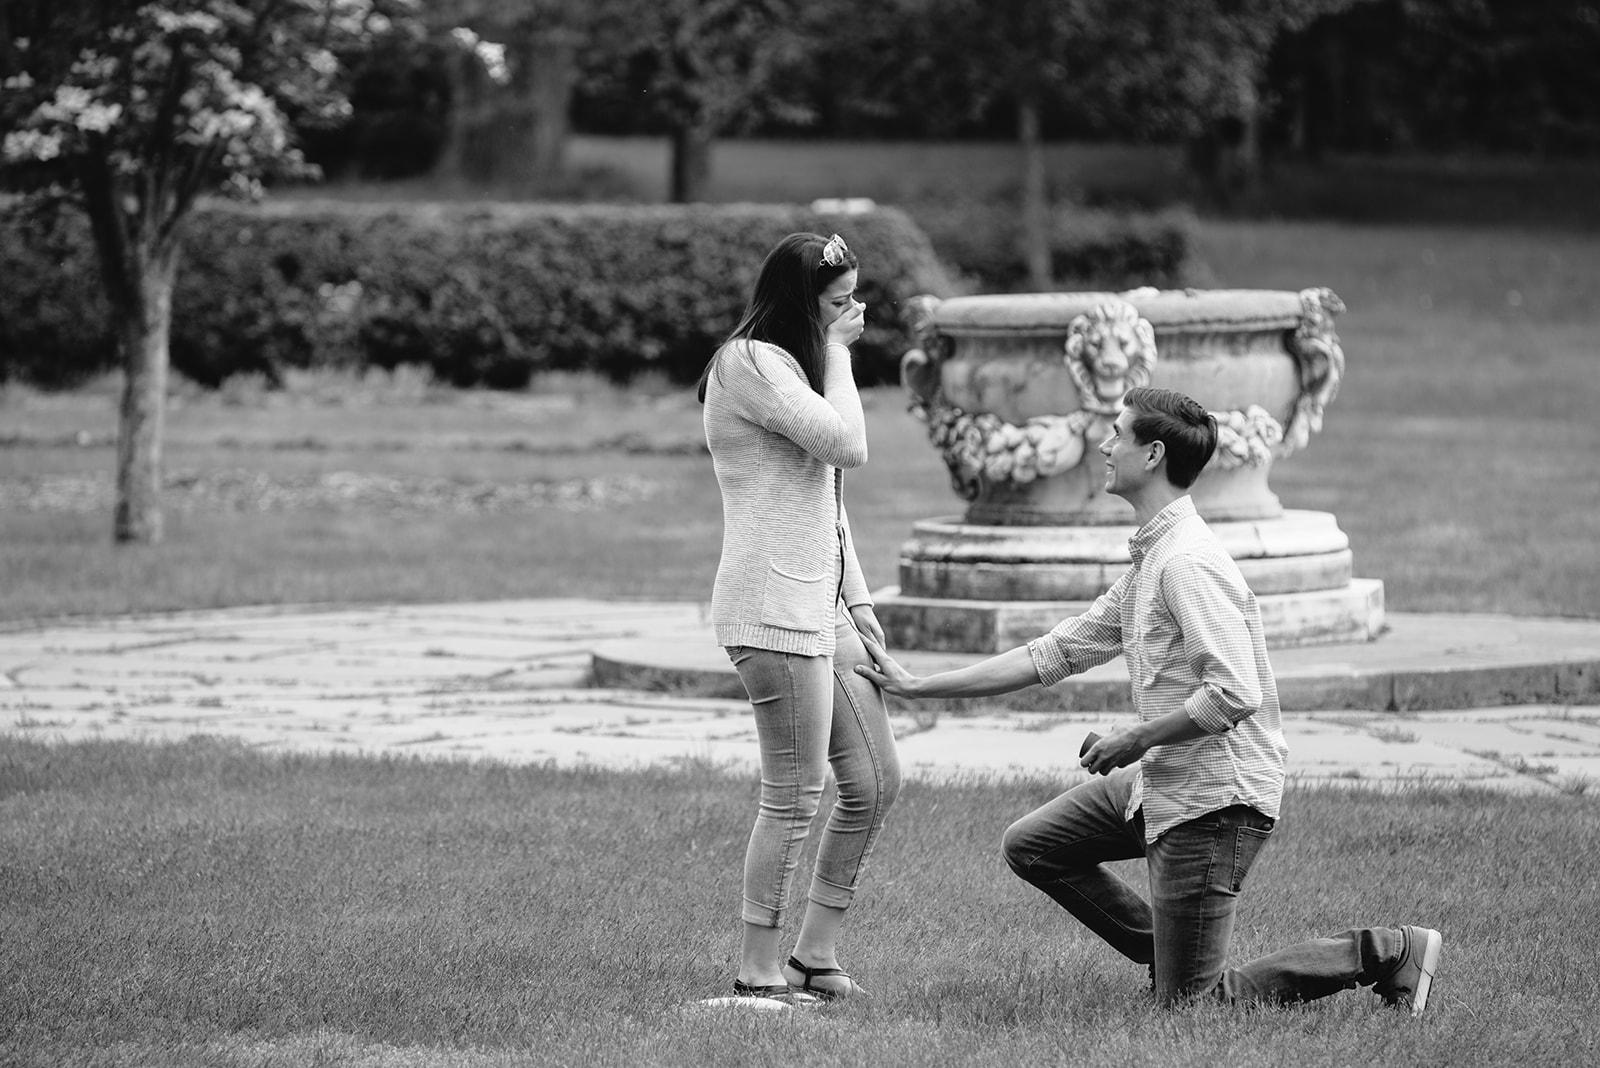 Surprise_Proposal-_NJ_Botanical_Gardens-_Greg_and_Jackie-New_Jersey-_Olivia_Christina_Photo-8.jpg